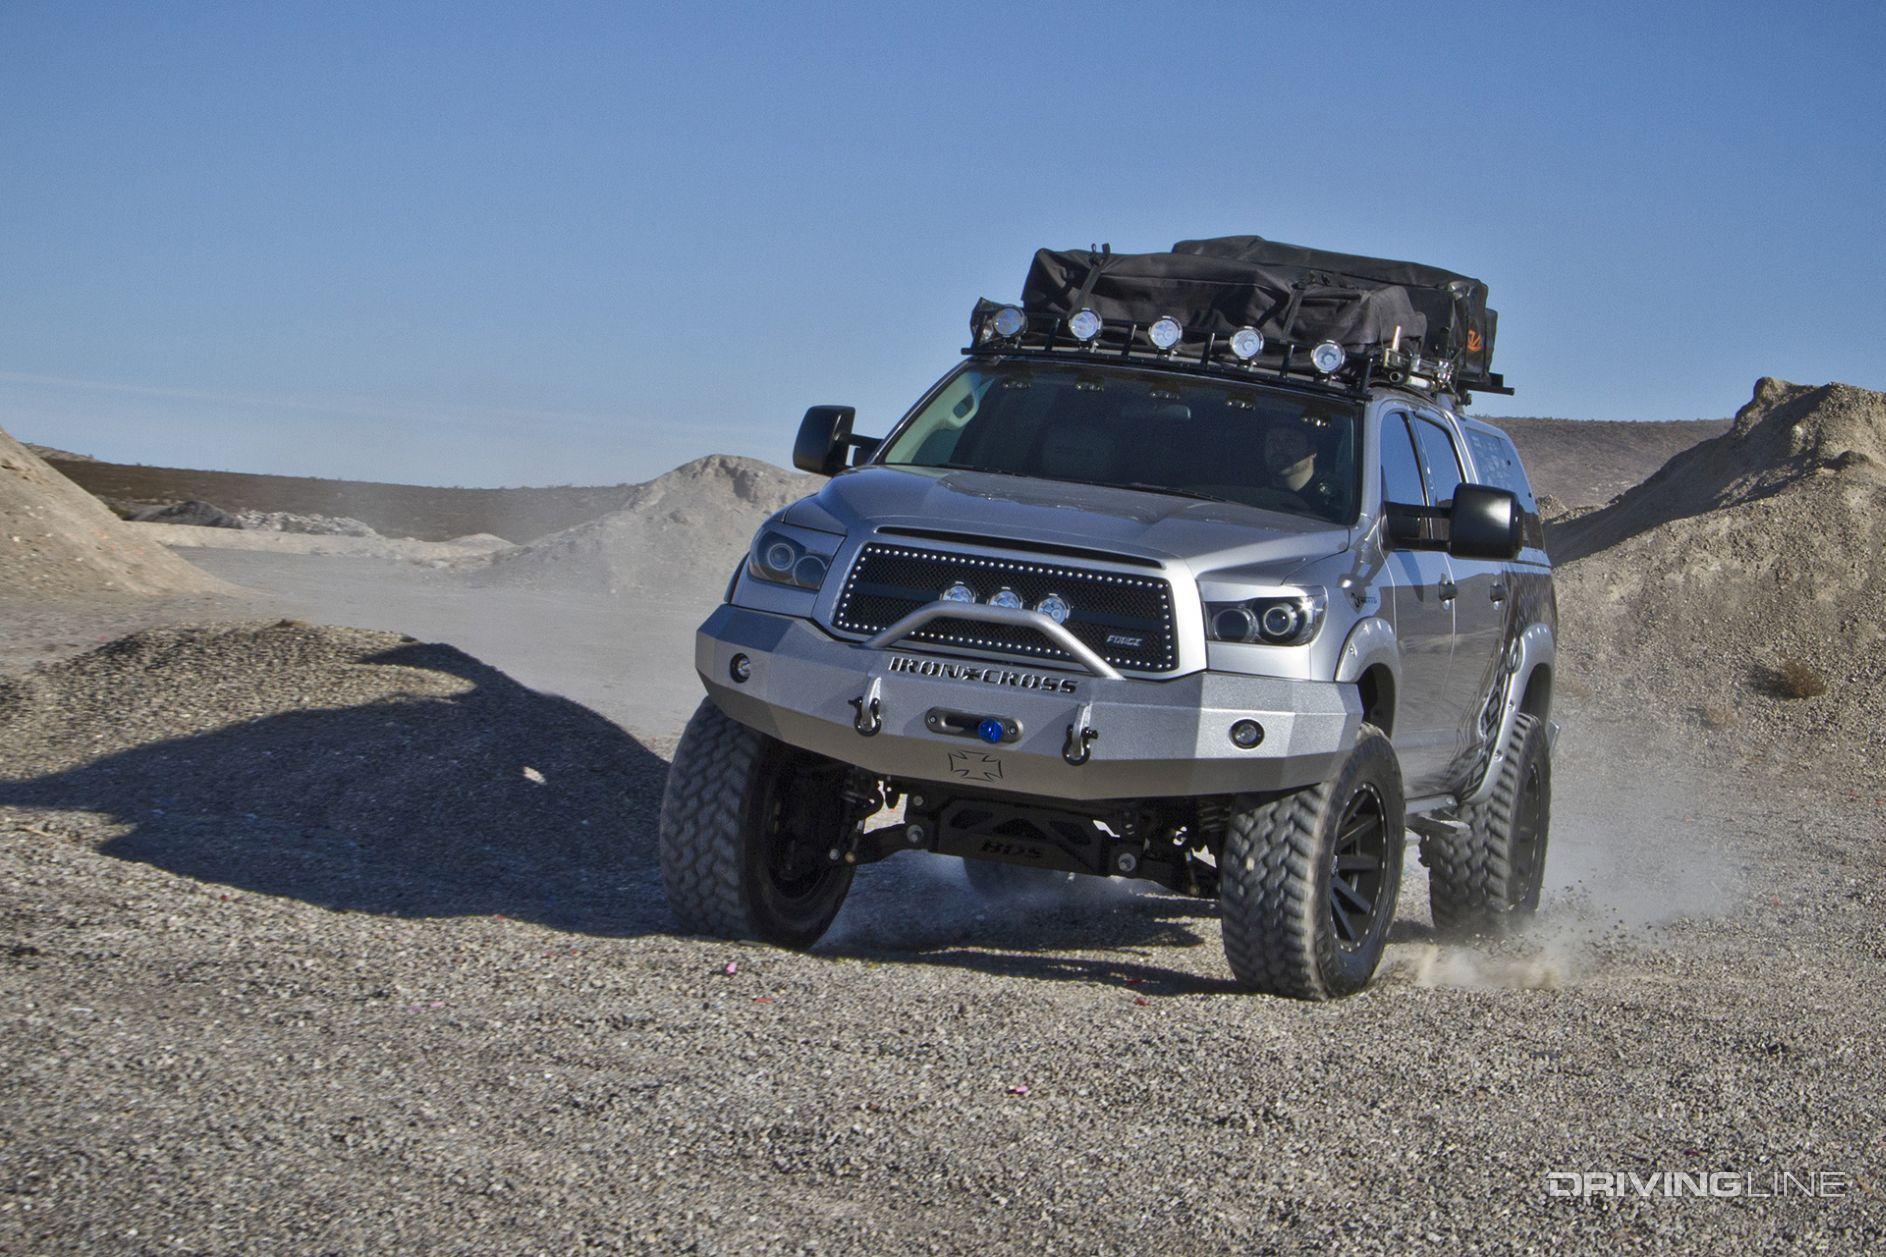 2016 Tundra Diesel >> Overland-Ready Toyota Tundra   DrivingLine